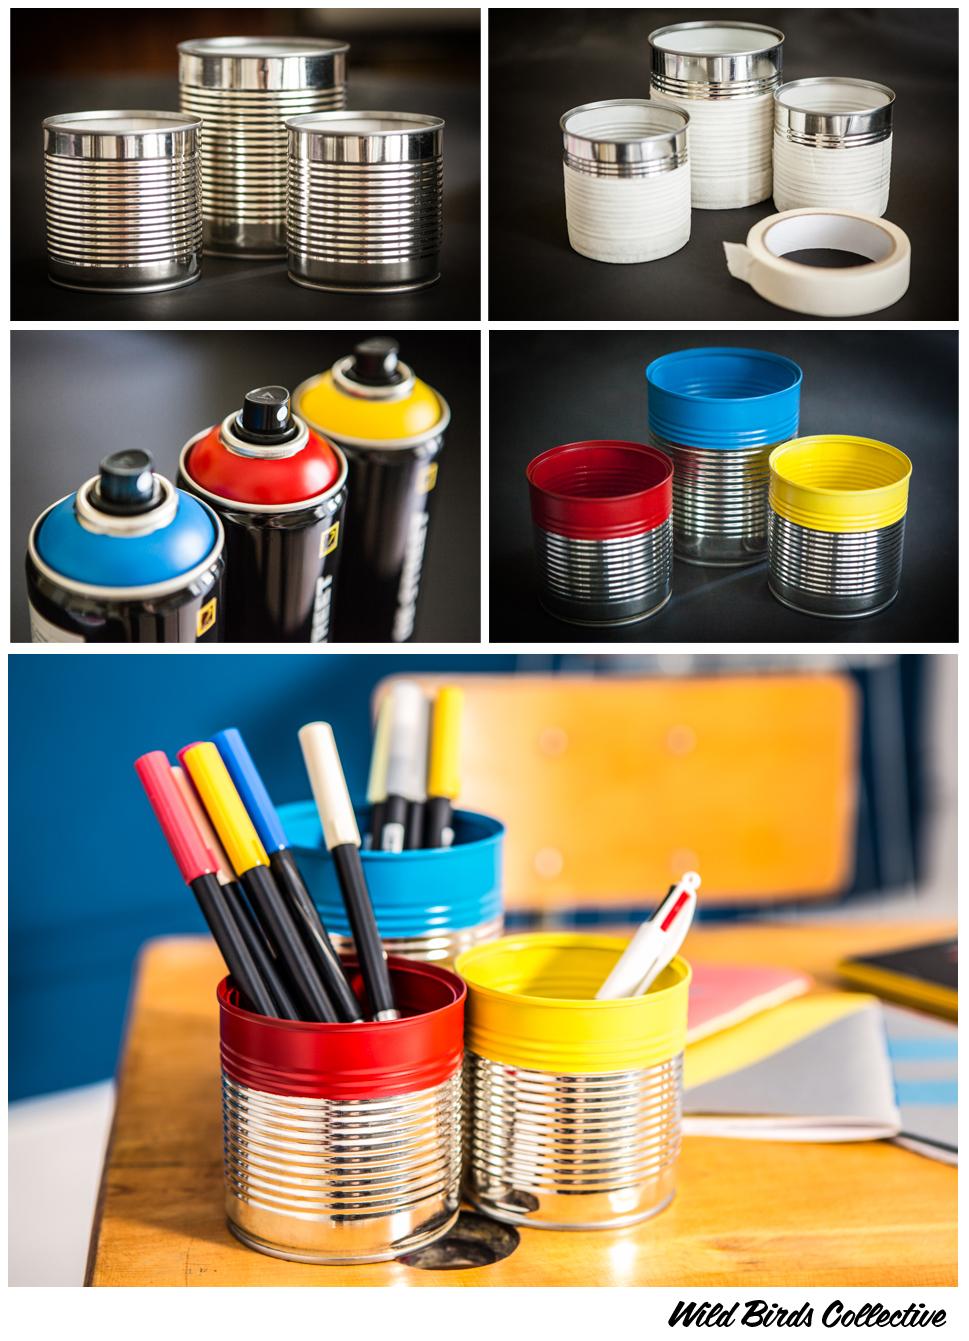 diy faire des pots crayons color s wild birds collective. Black Bedroom Furniture Sets. Home Design Ideas